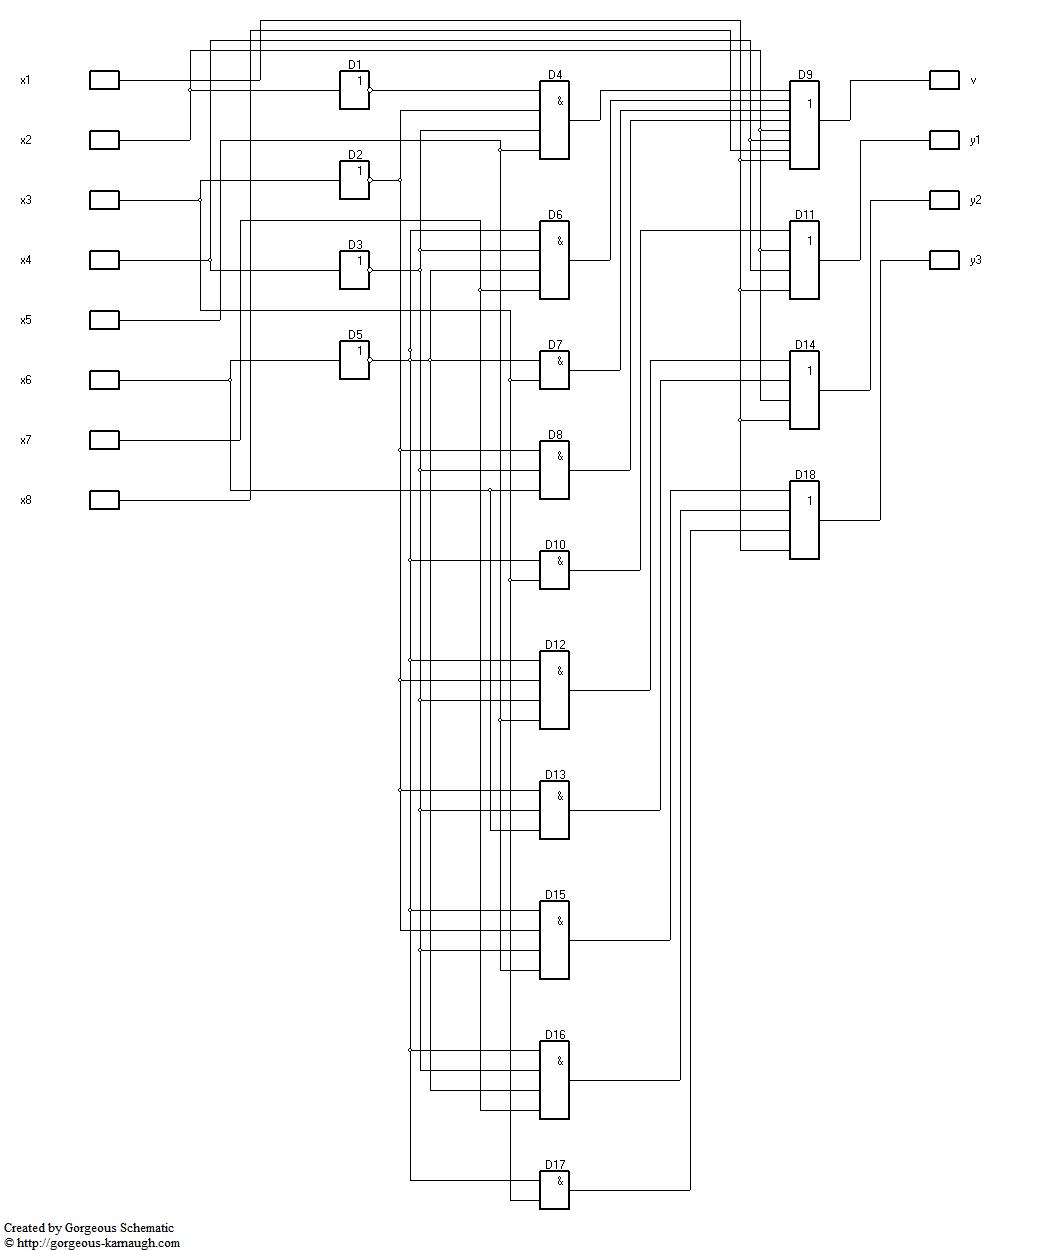 [NL_0549] Logic Diagram Of 8 To 3 Encoder Schematic Wiring